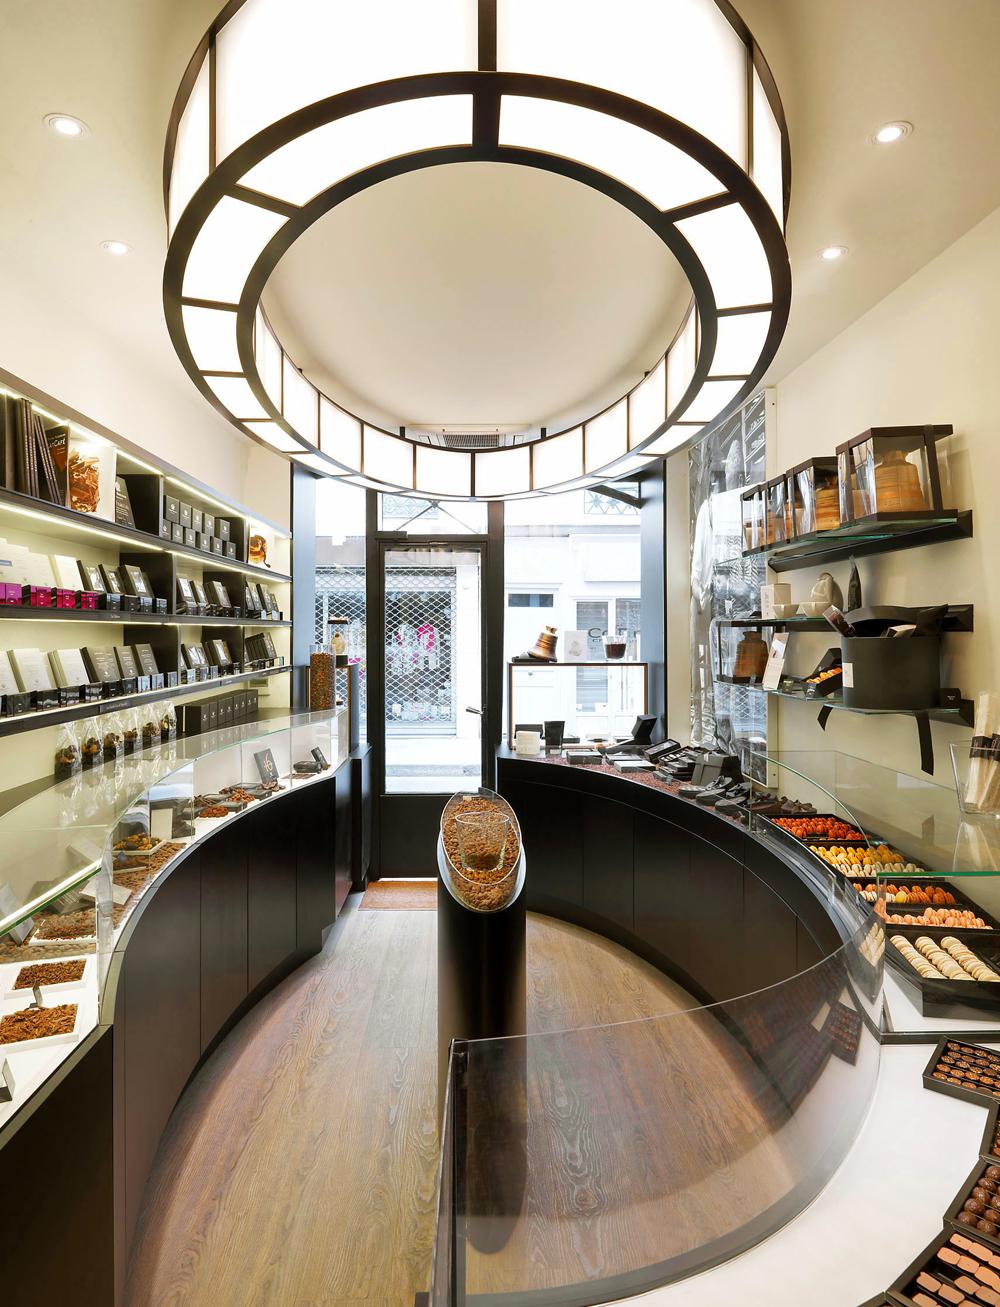 michel penneman interior design brussels paris taÏwan monaco marcolini chocolate chocolaterie